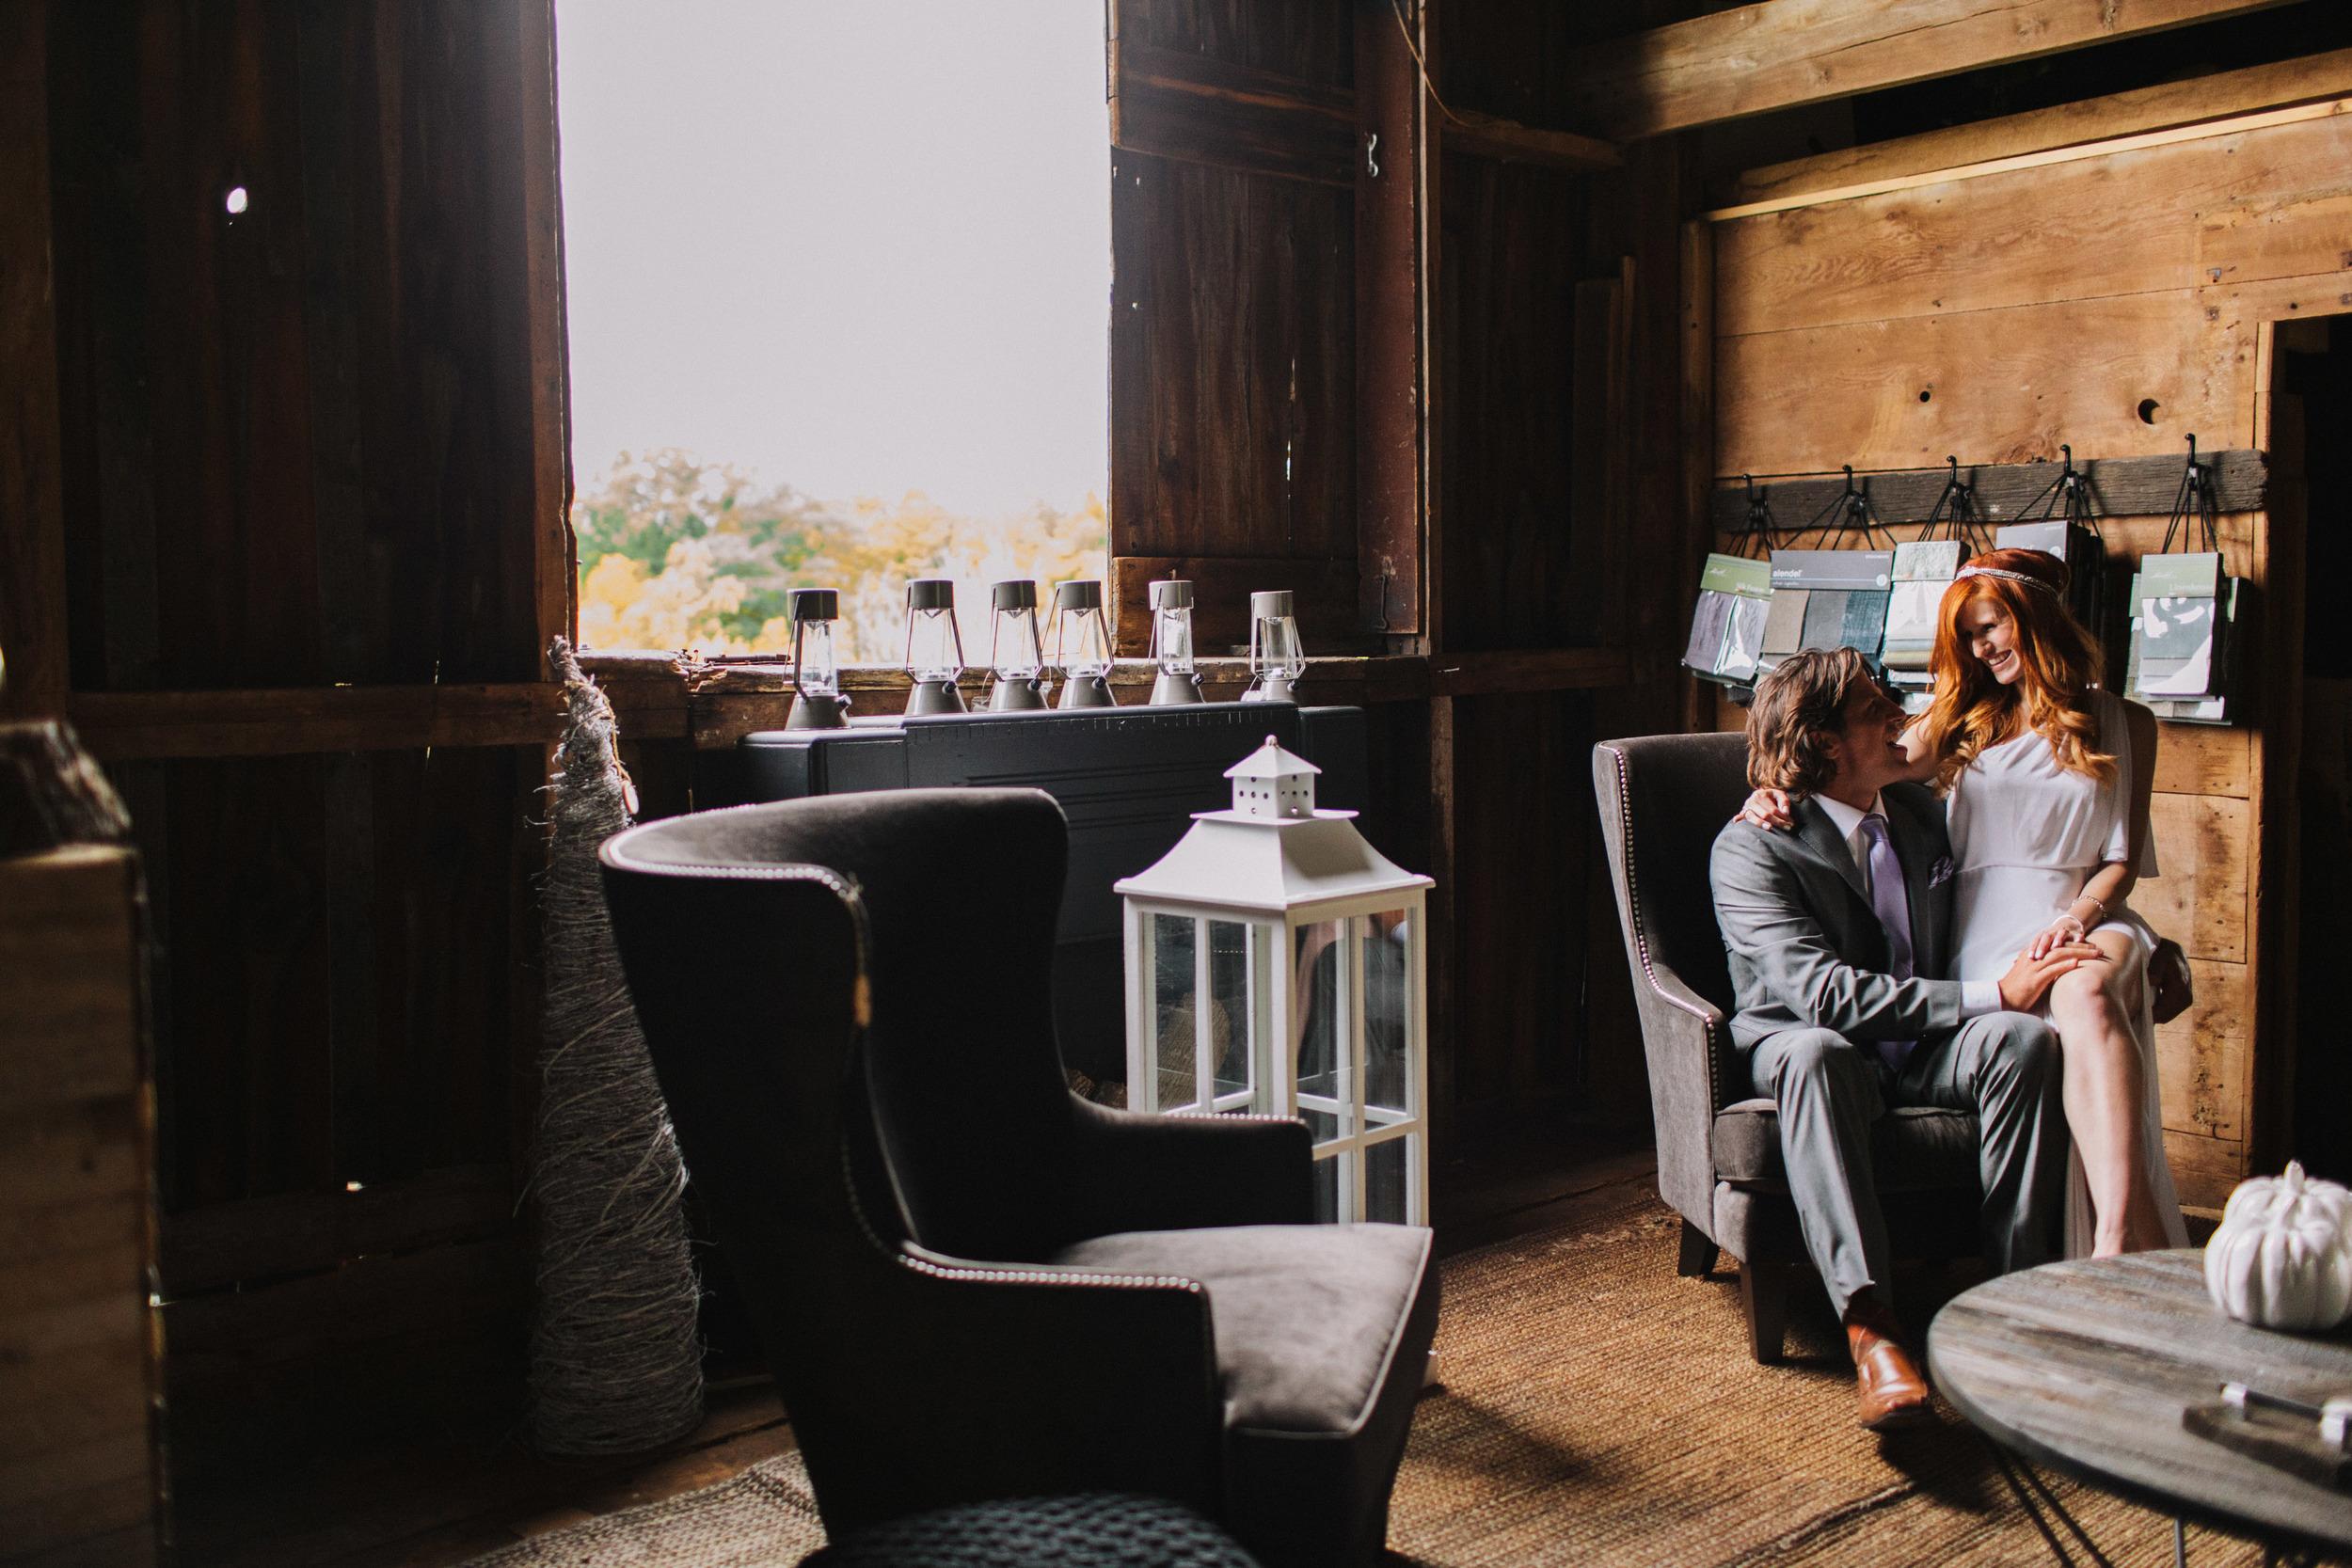 rivercroft-interiors-michael-rousseau-photography018.jpg